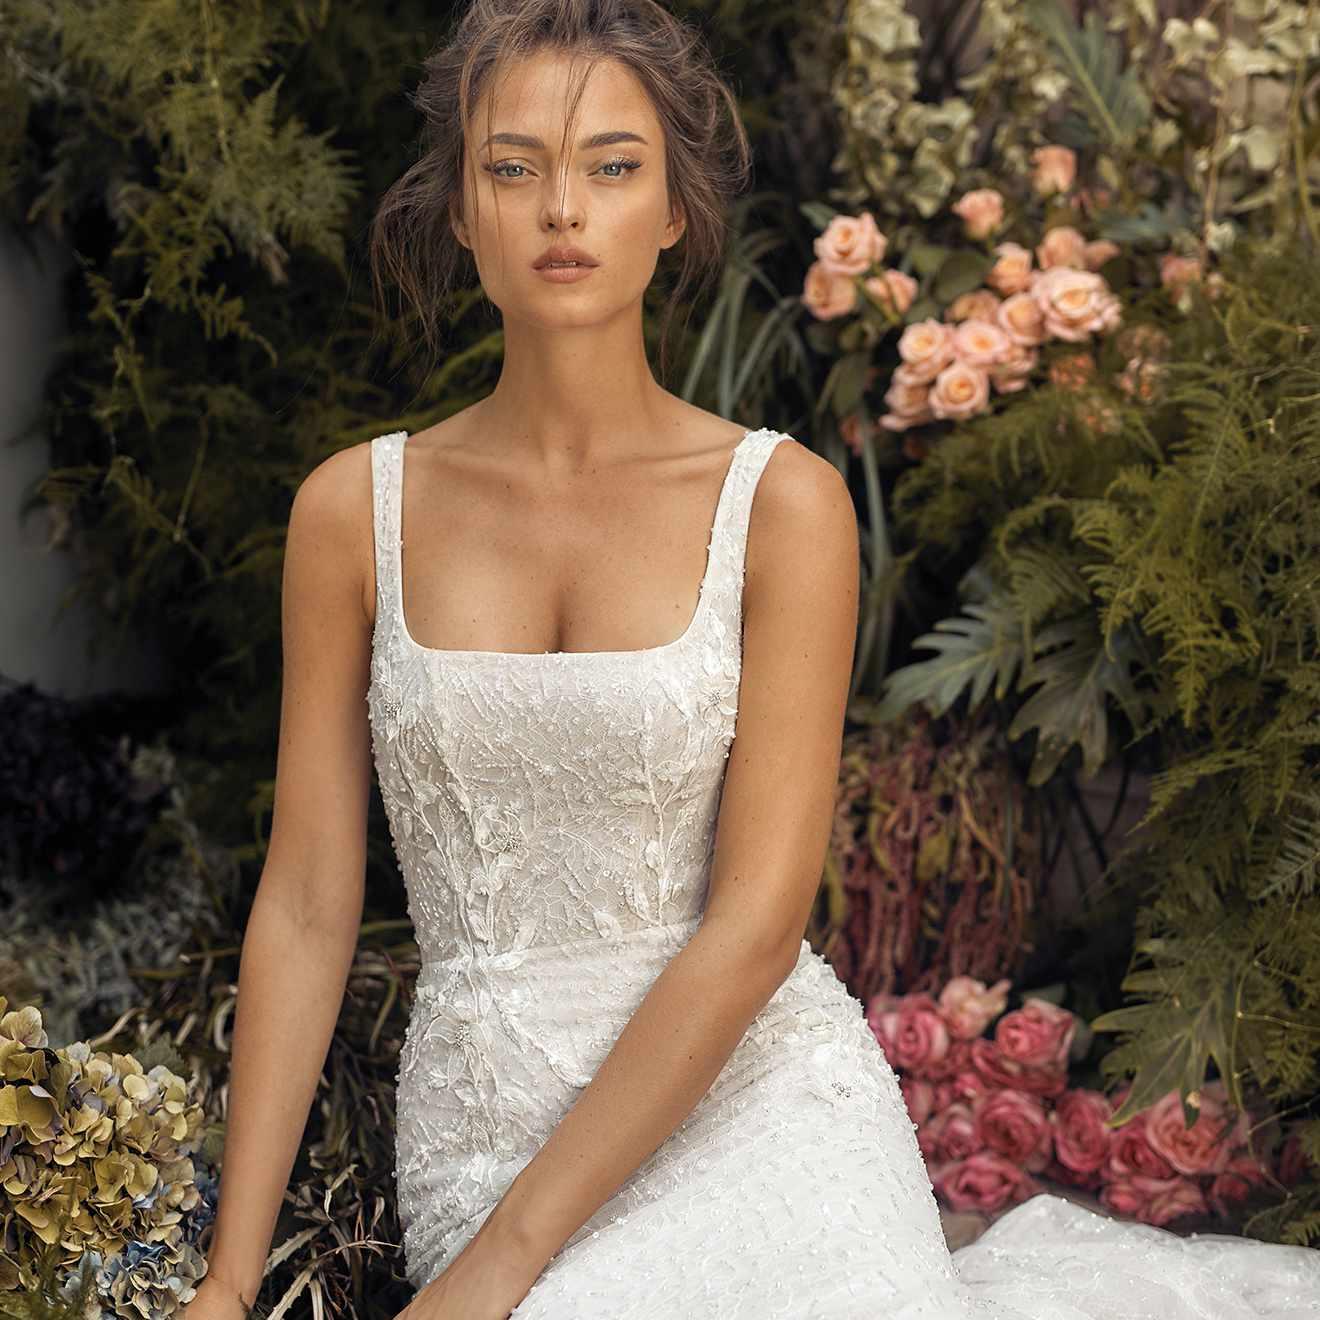 Olive wedding dress